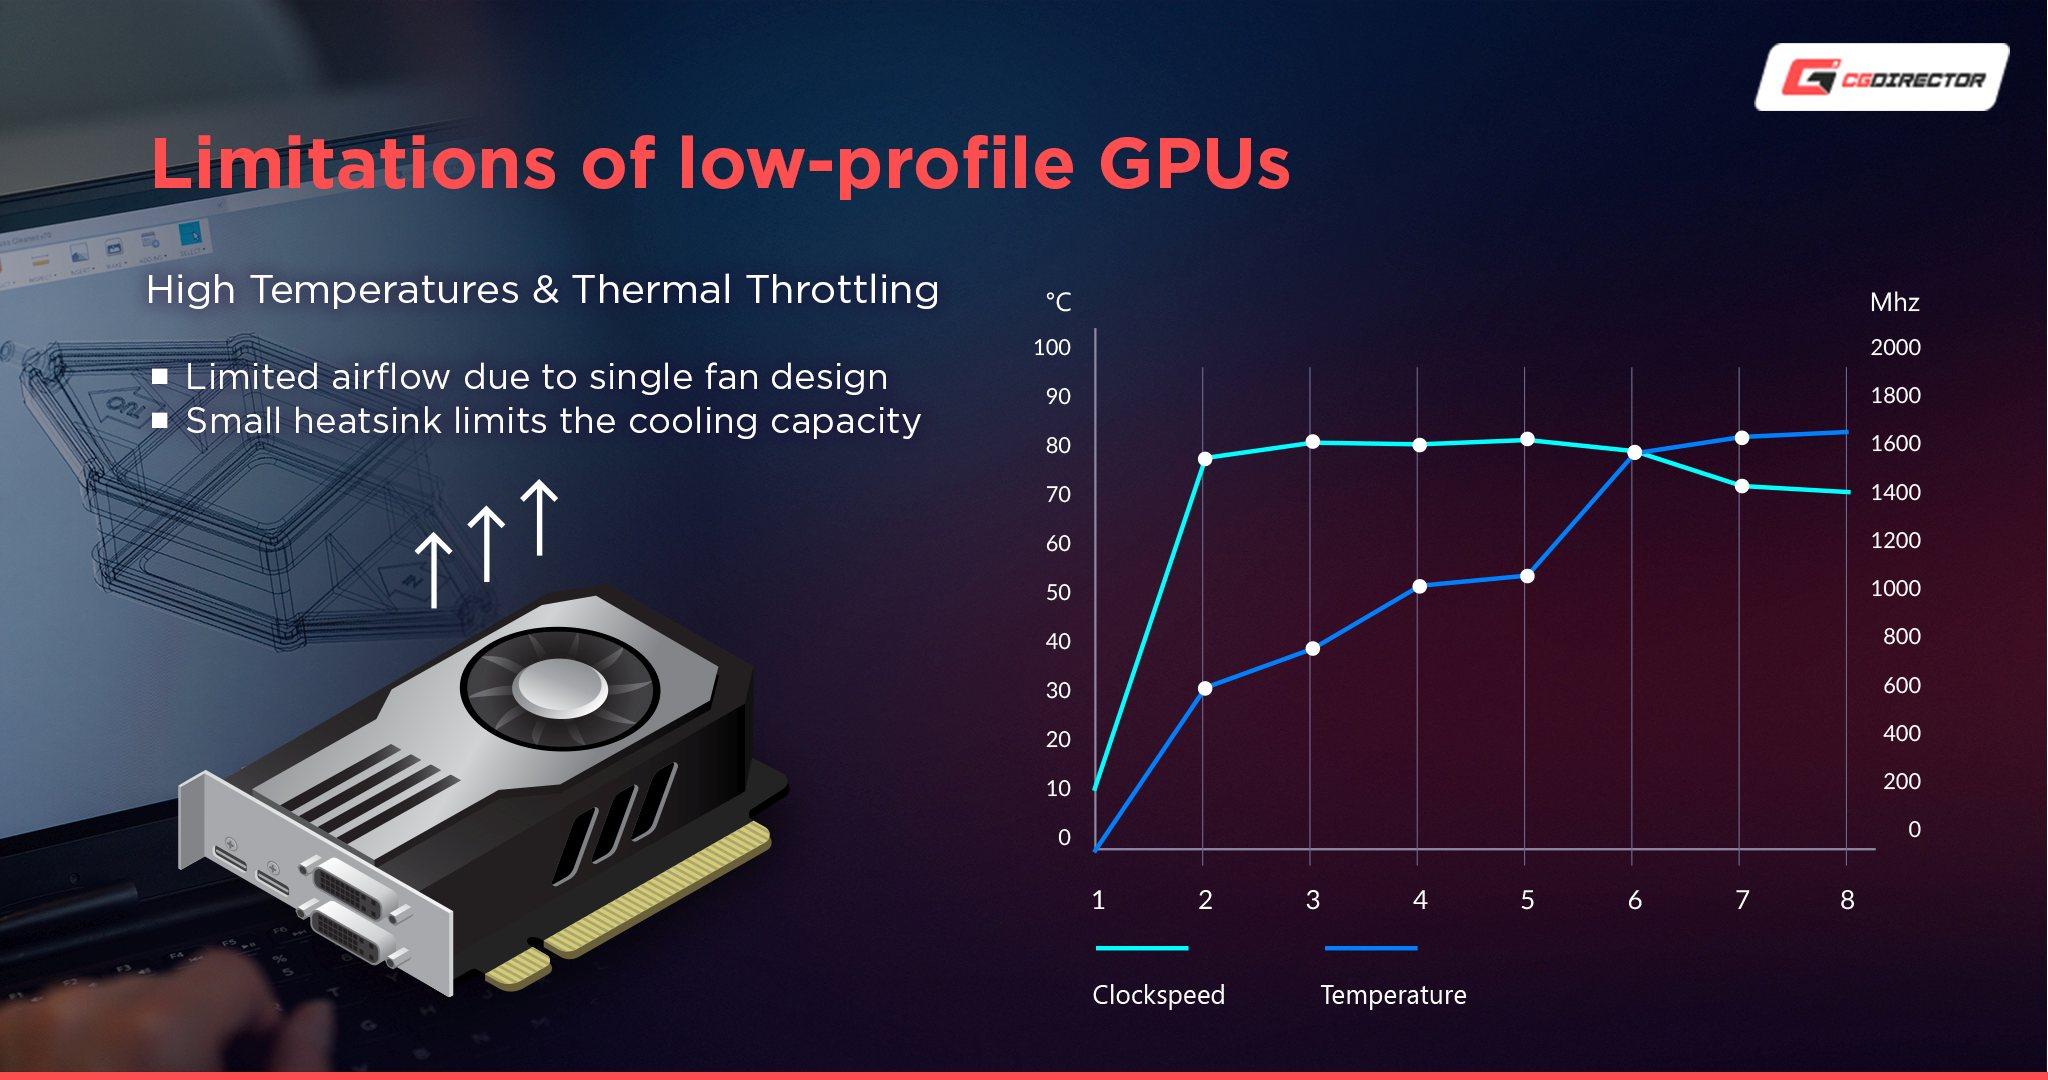 Downsides low profile GPUS - Temperature Throttling